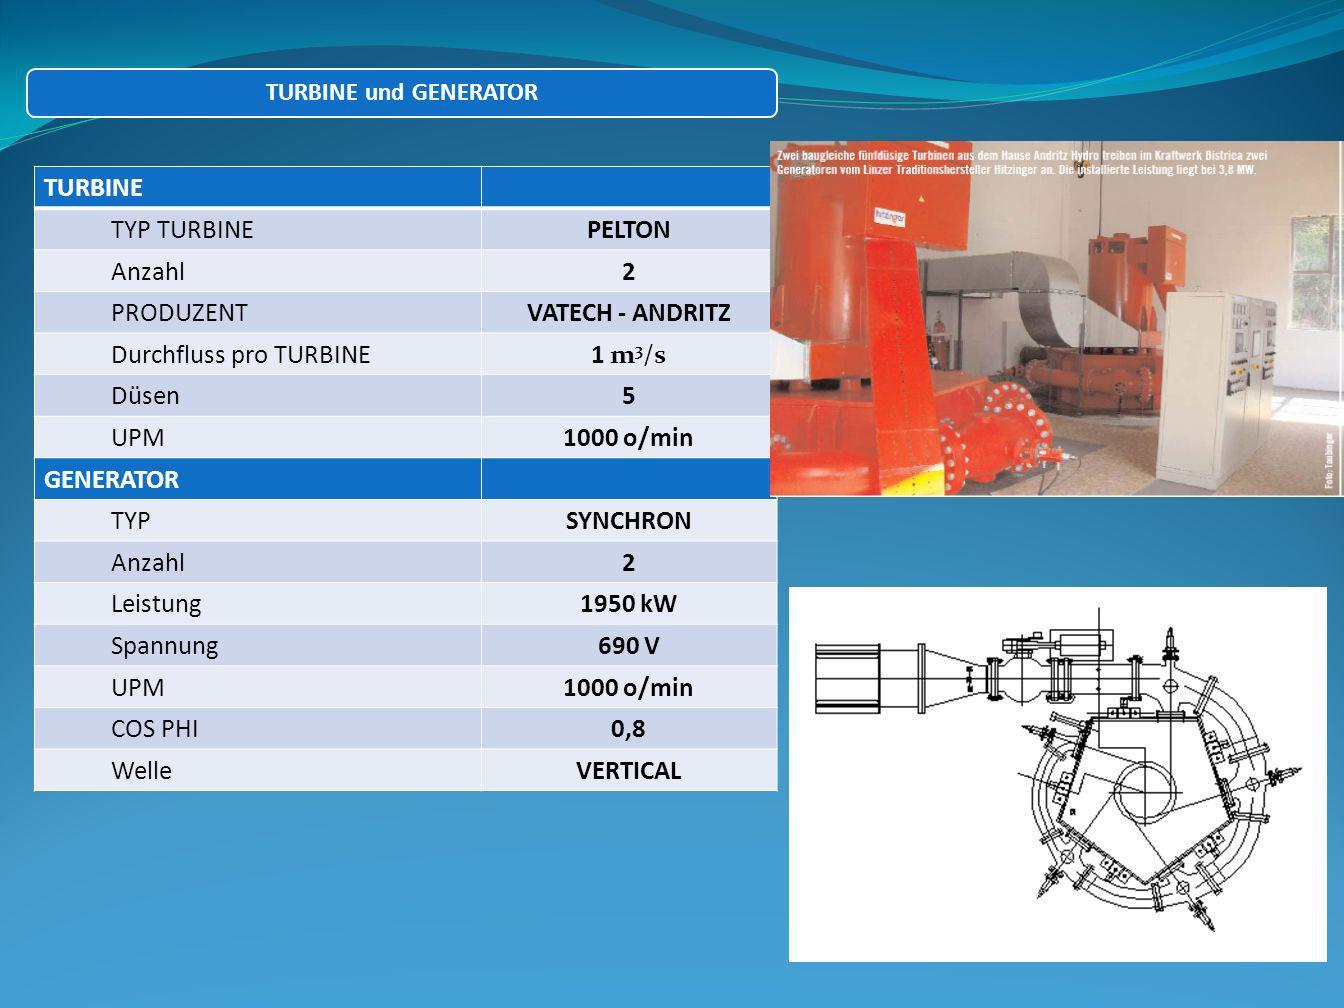 Durchfluss pro TURBINE 1 m3/s Düsen 5 UPM 1000 o/min GENERATOR TYP